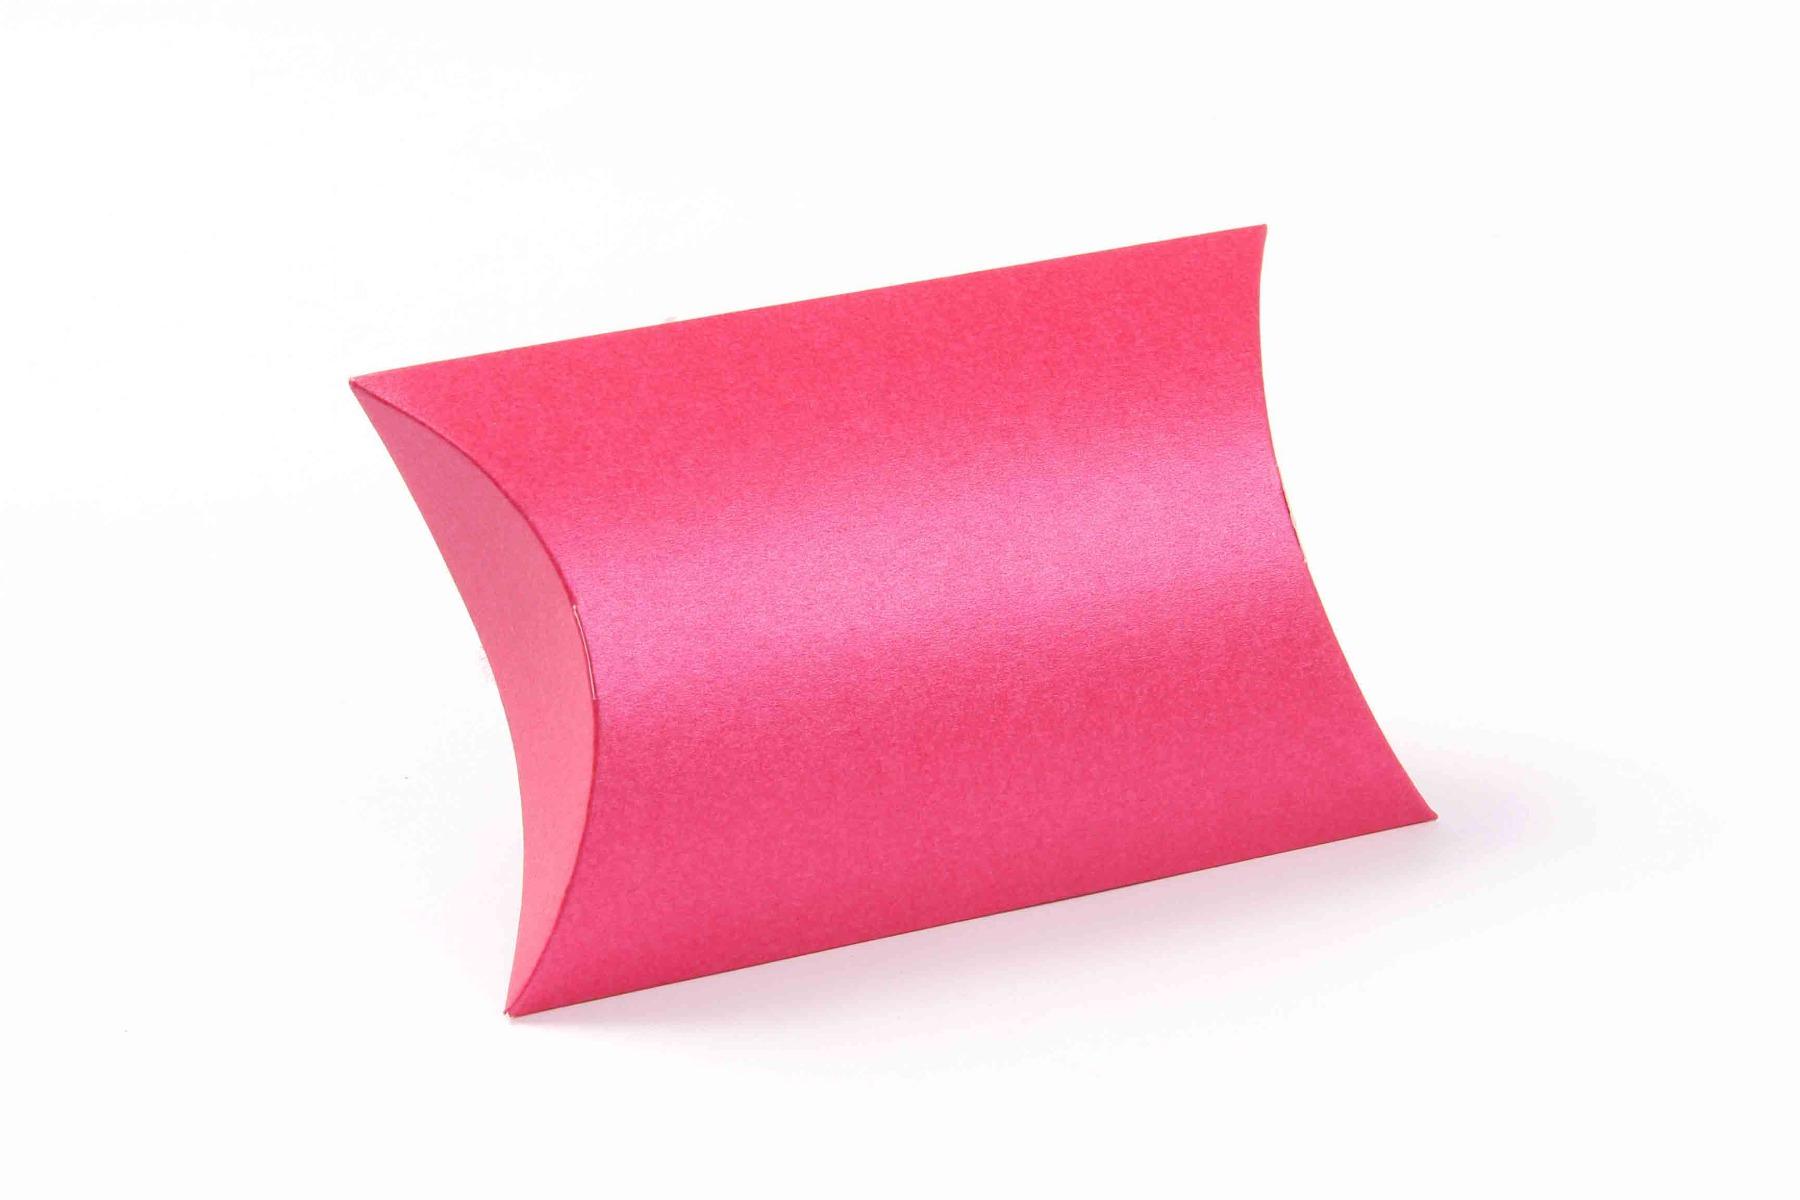 Pillow Favor Box No 9 - Pink-8637